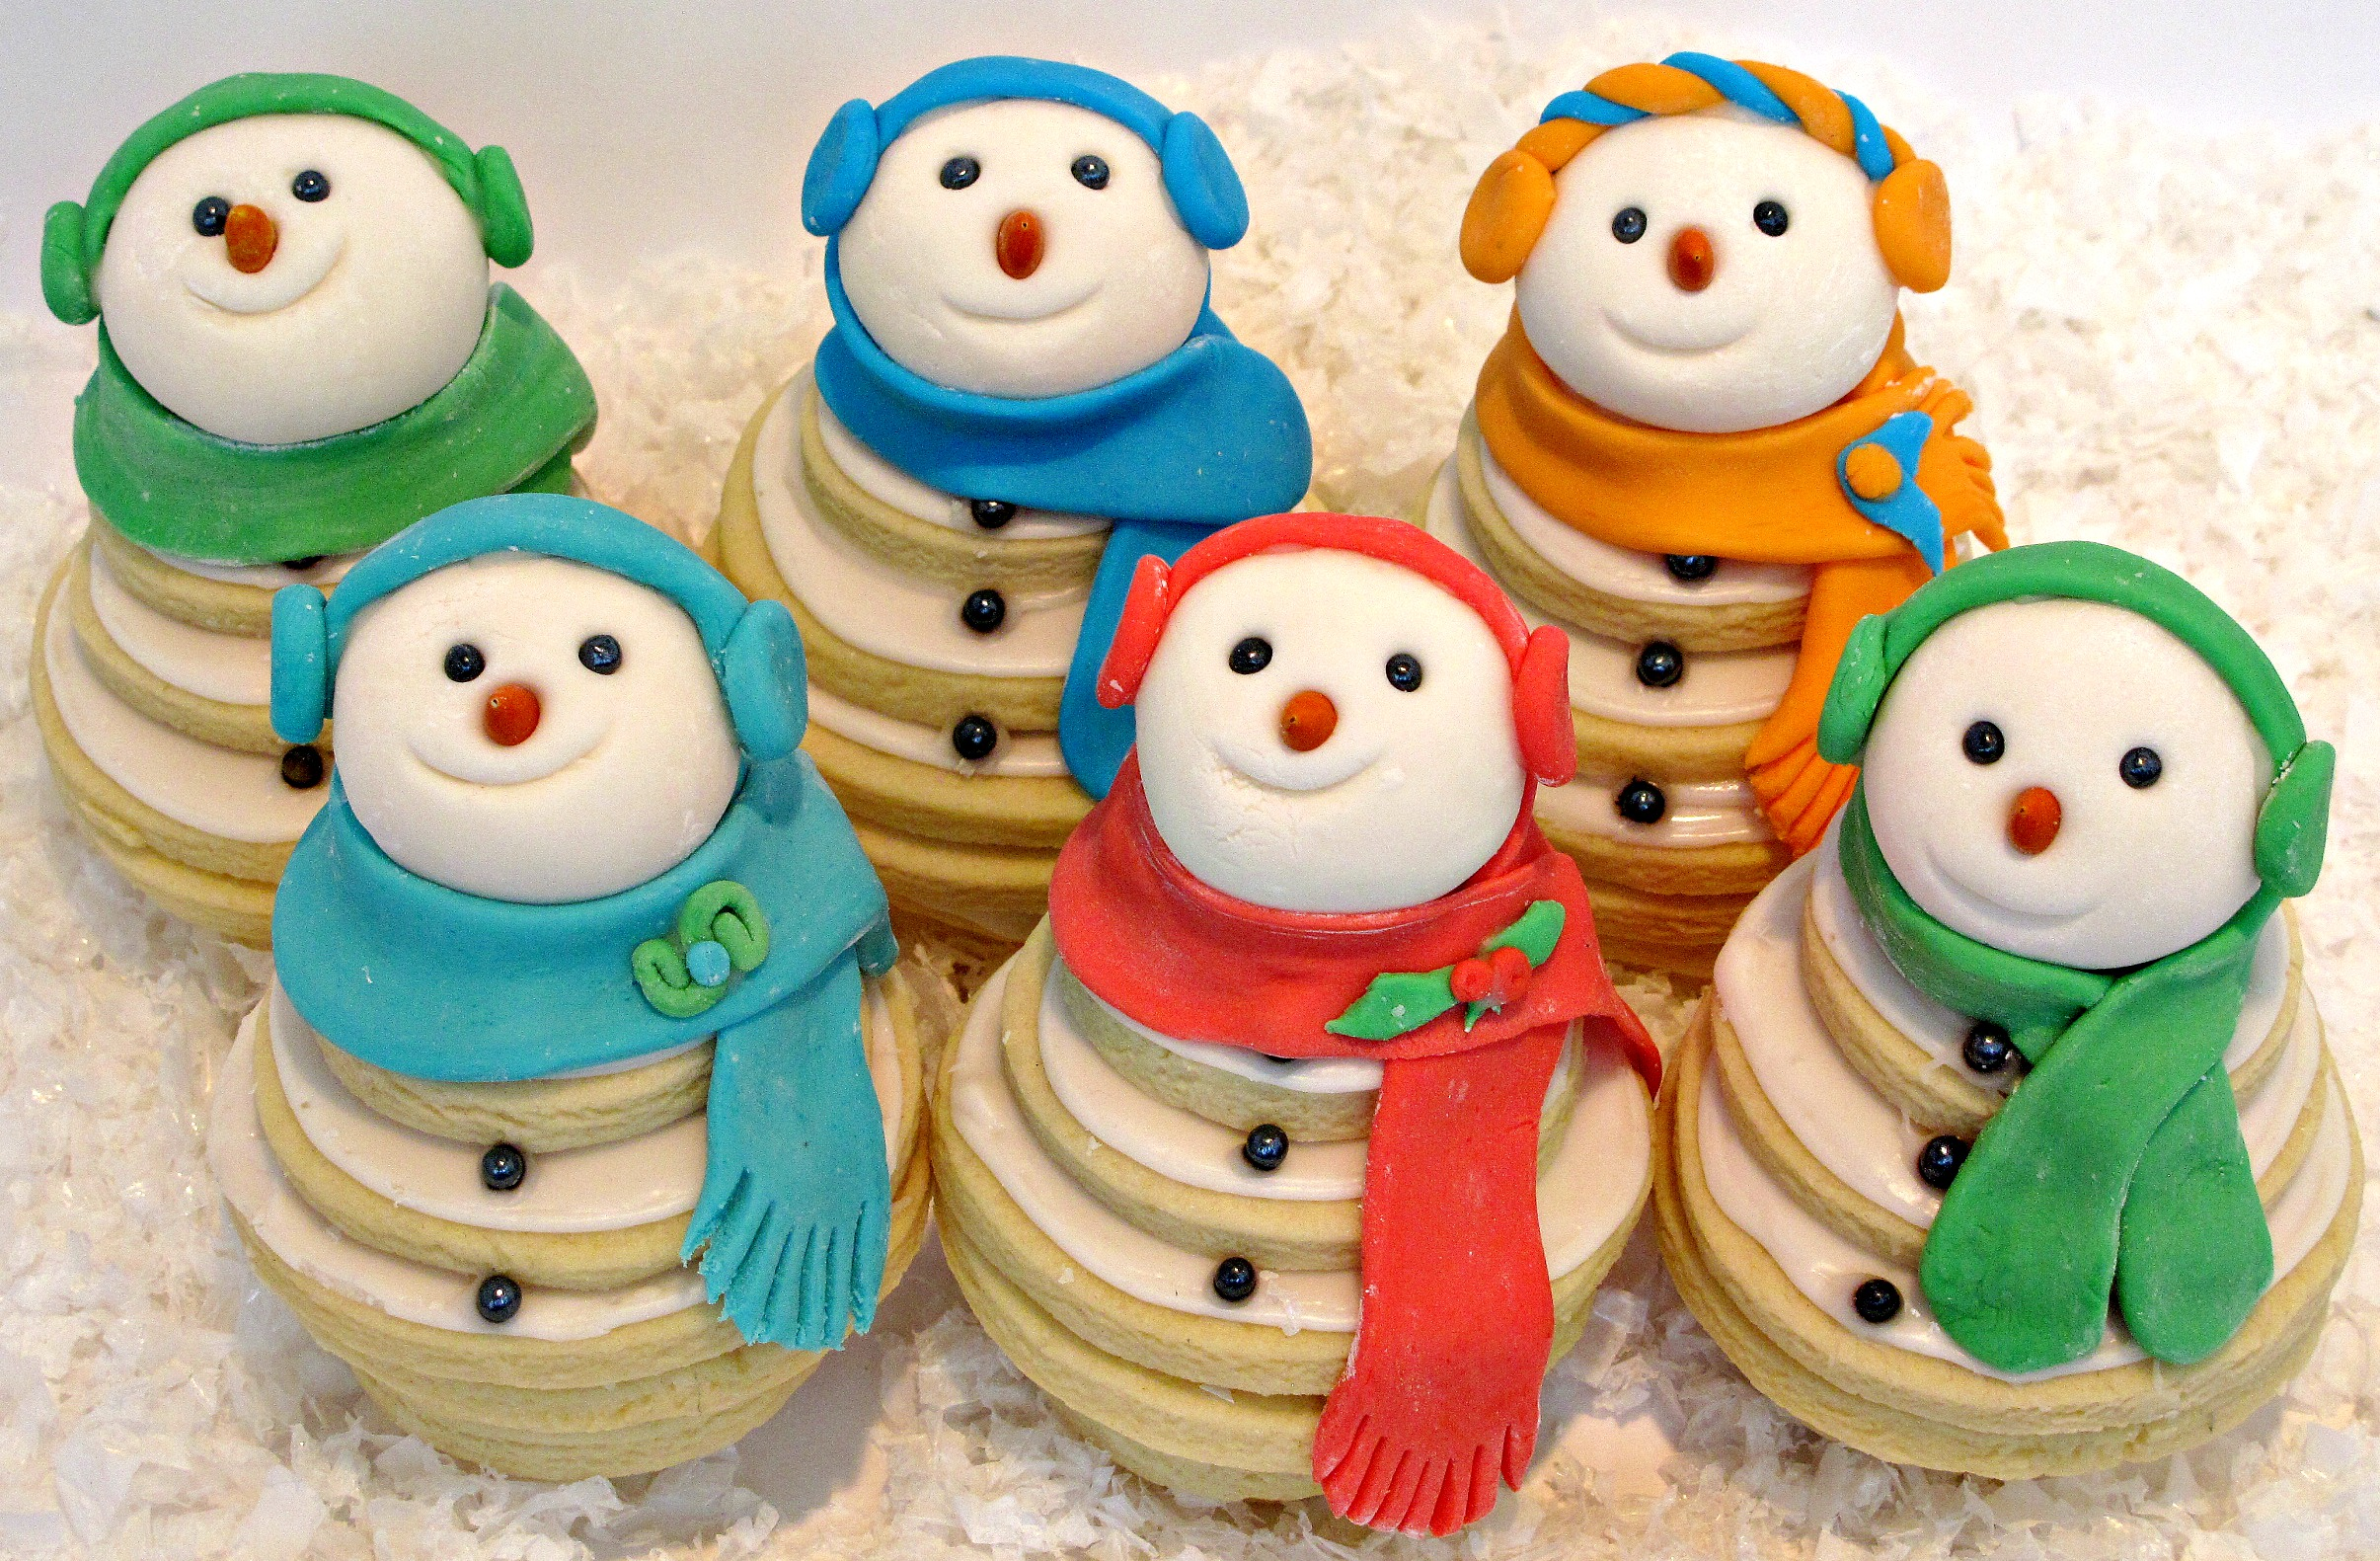 Smiling Snowman Stacks